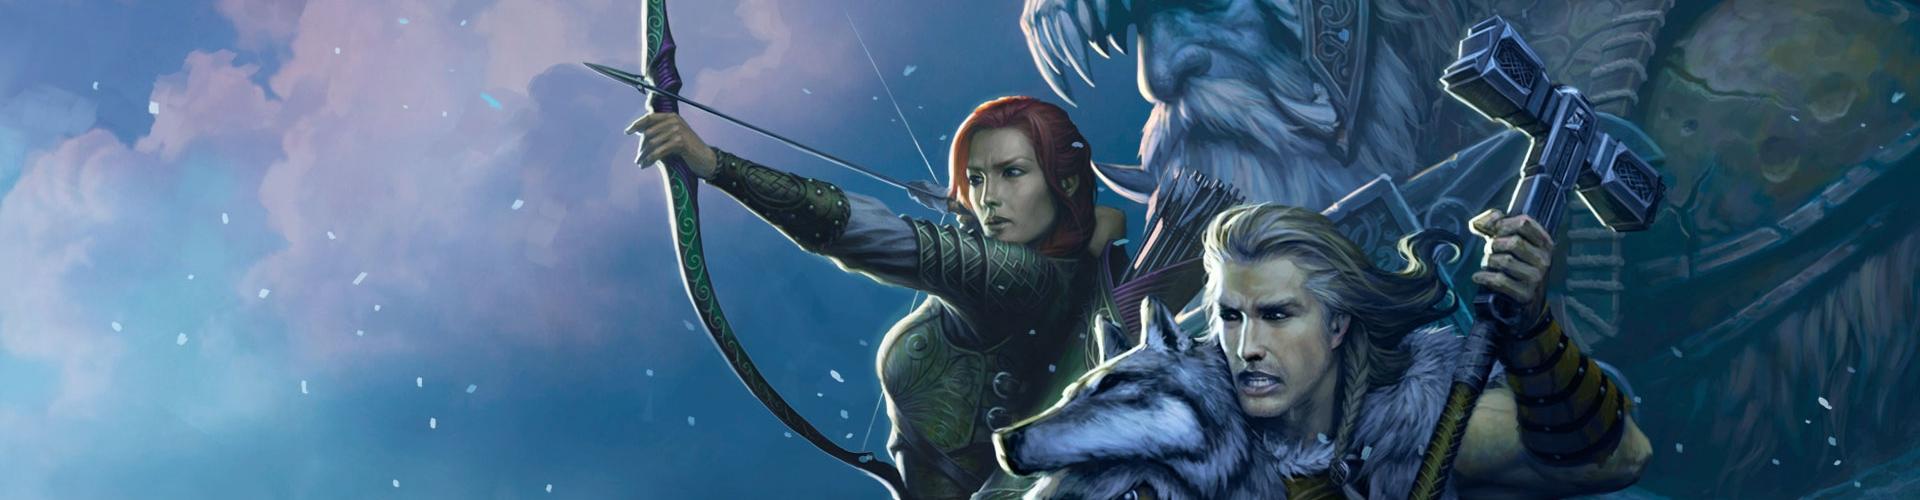 Thomas Foss on Neverwinter: Storm King's Thunder